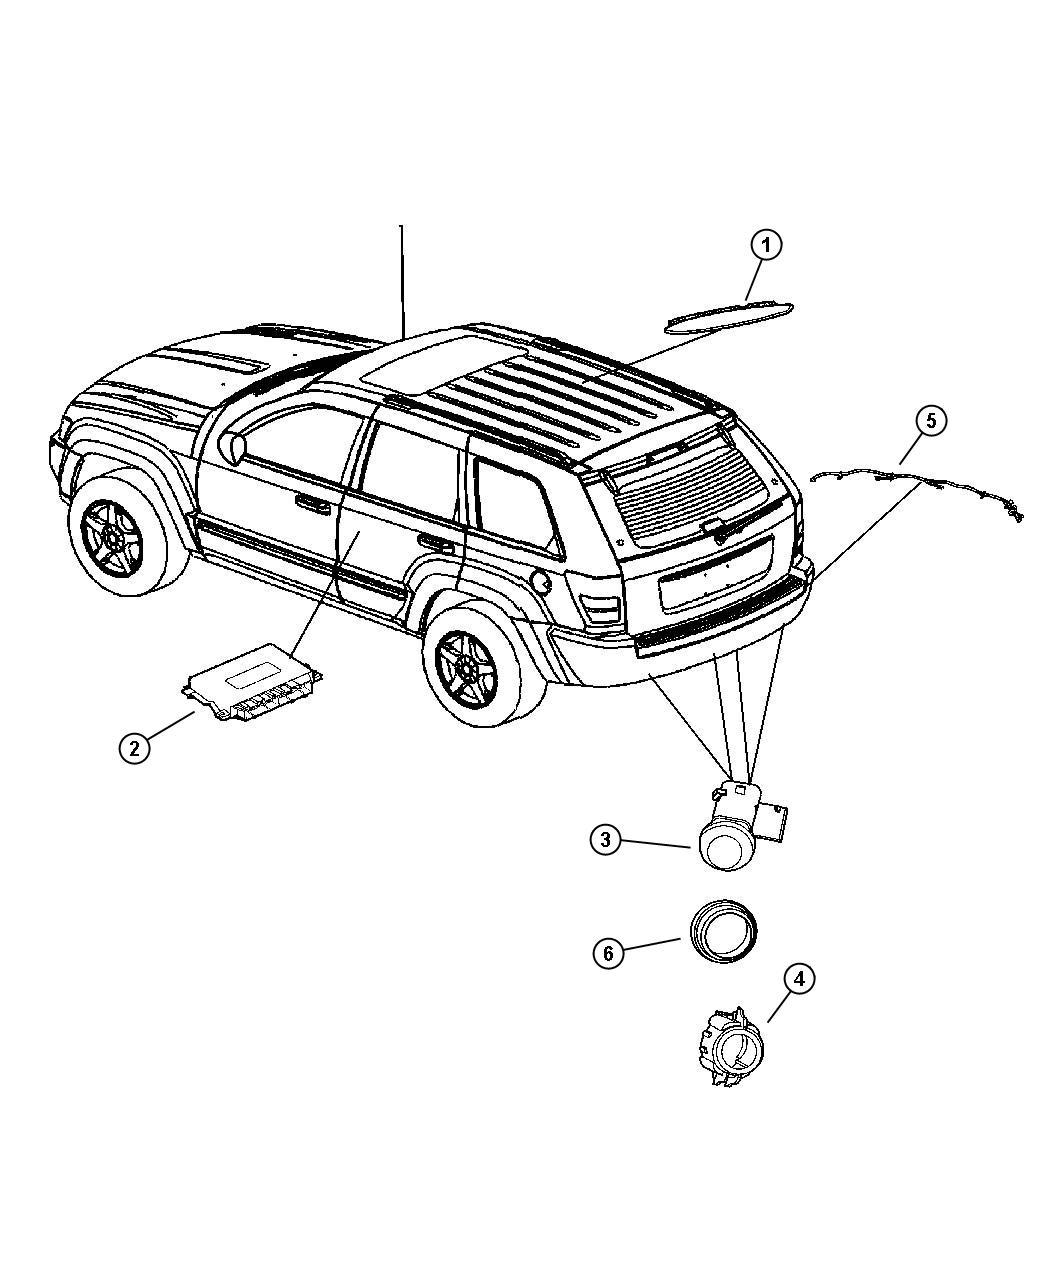 Jeep Grand Cherokee Bracket Sensor Mounting Assist